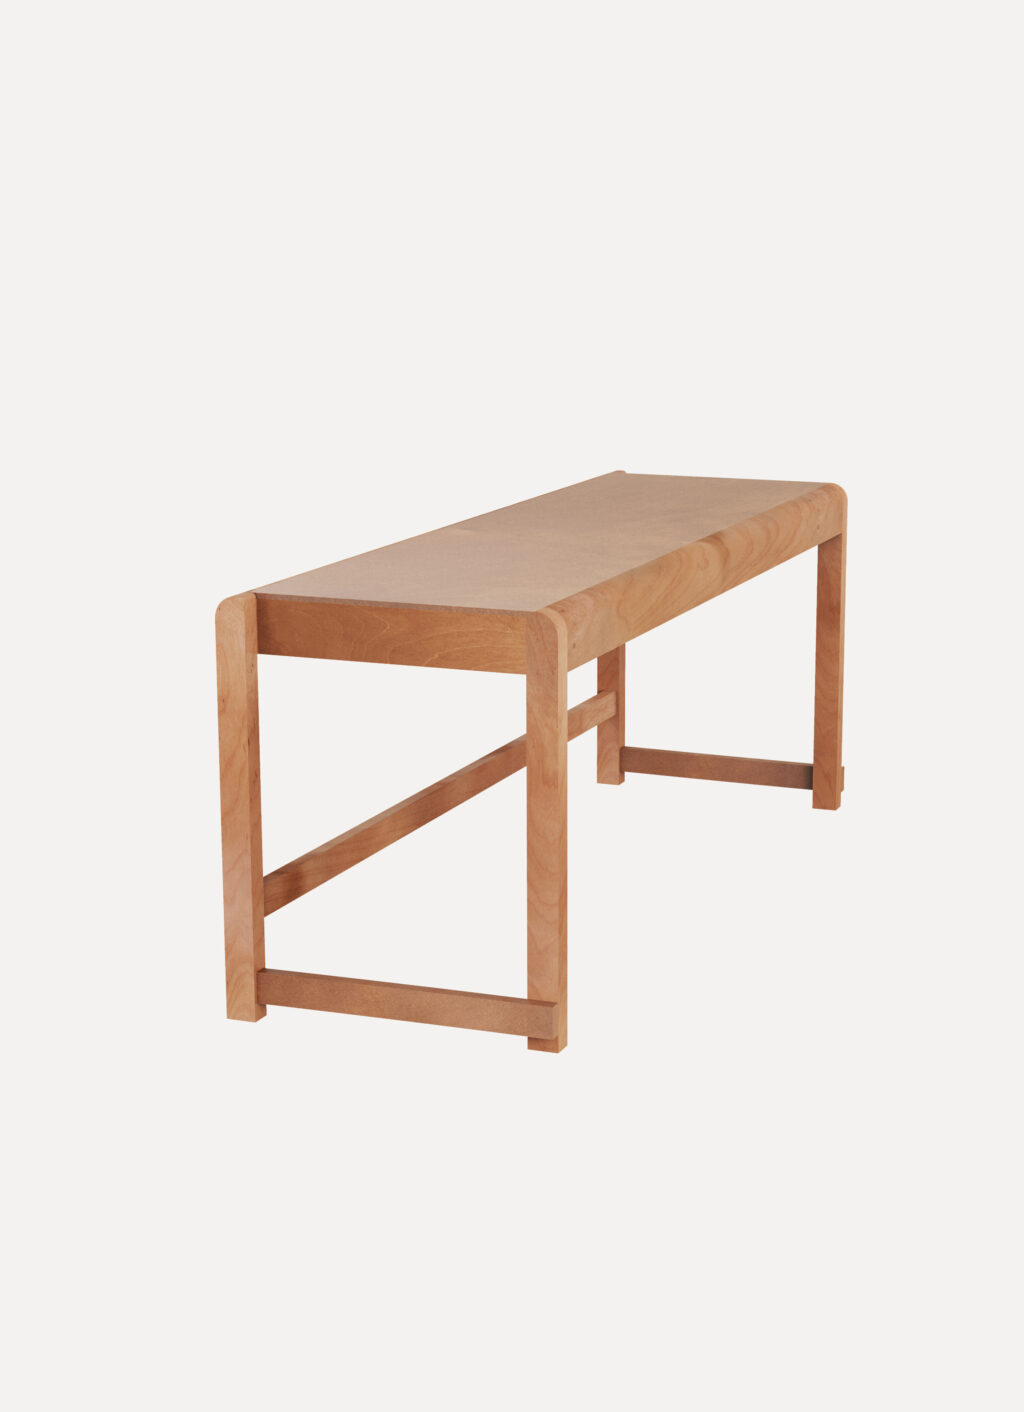 Frama - Bench 01 - Warm Brown Wood